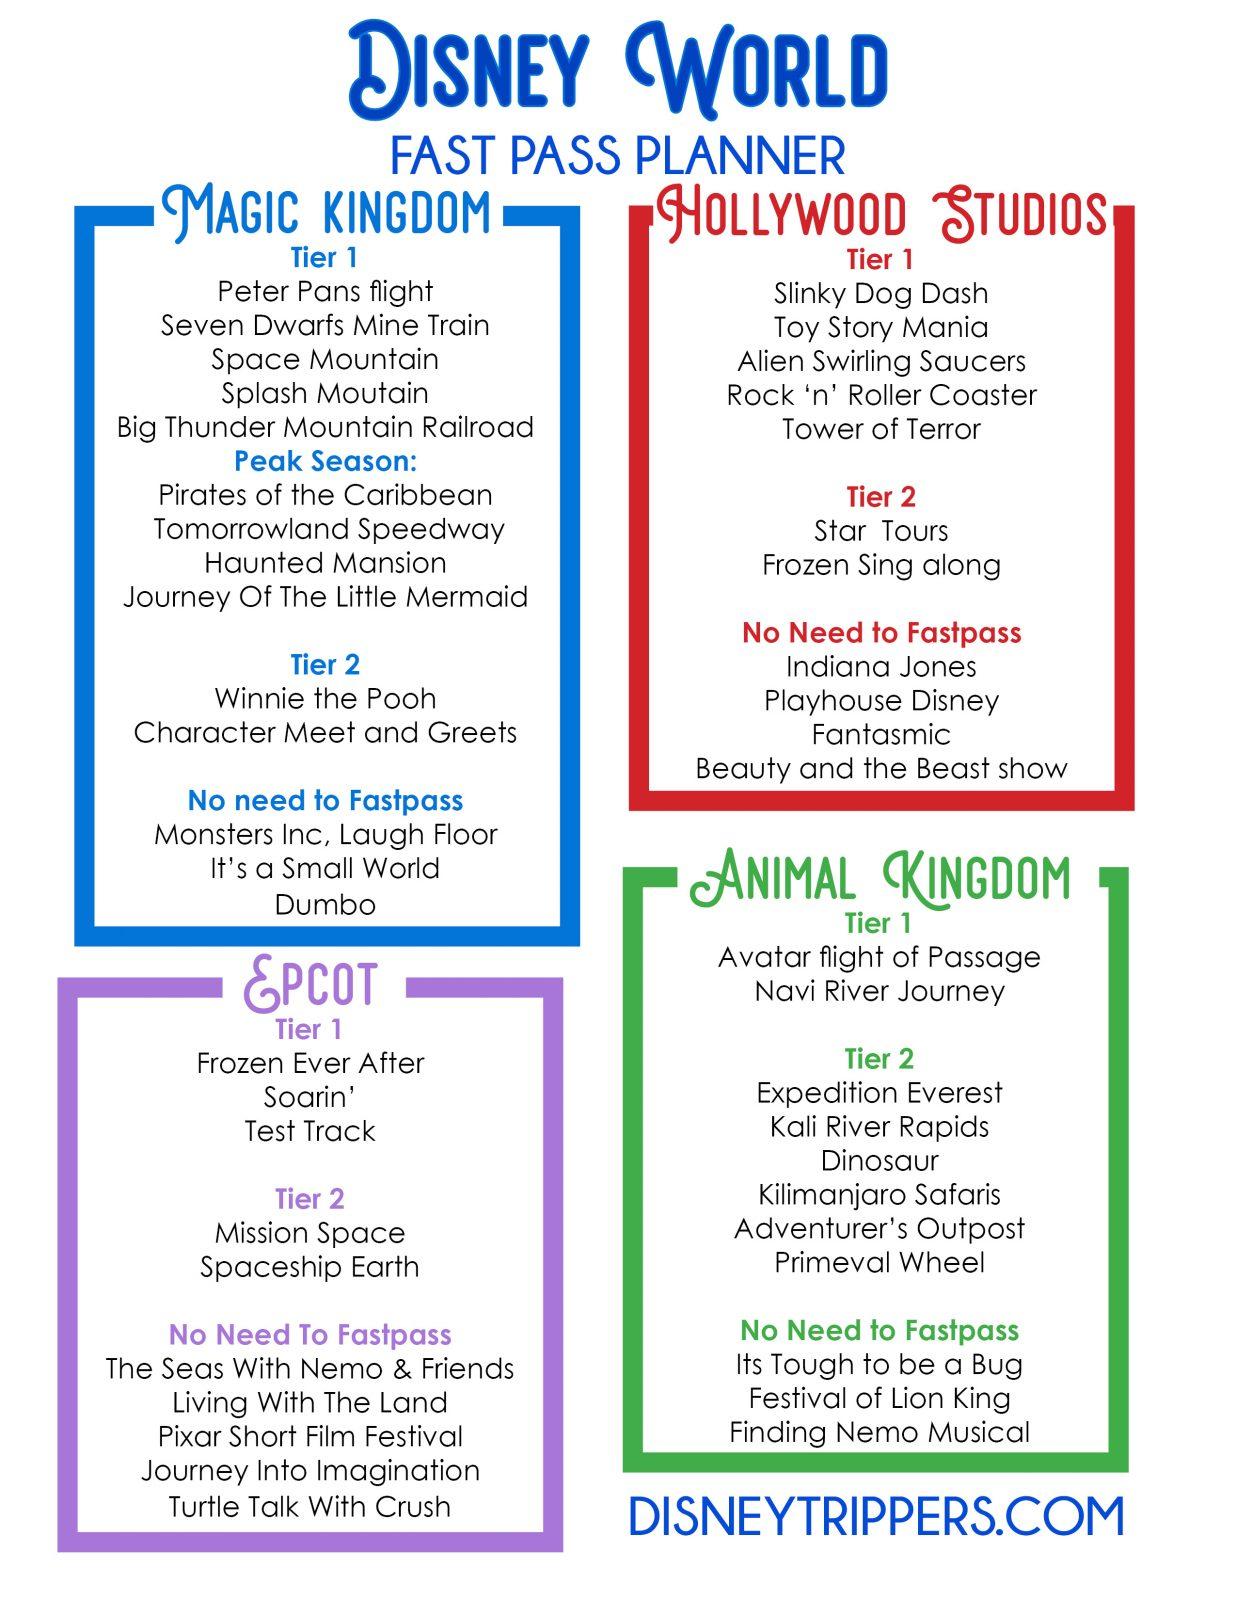 50 Best (And Worst) Disney World Fastpasses + Insider